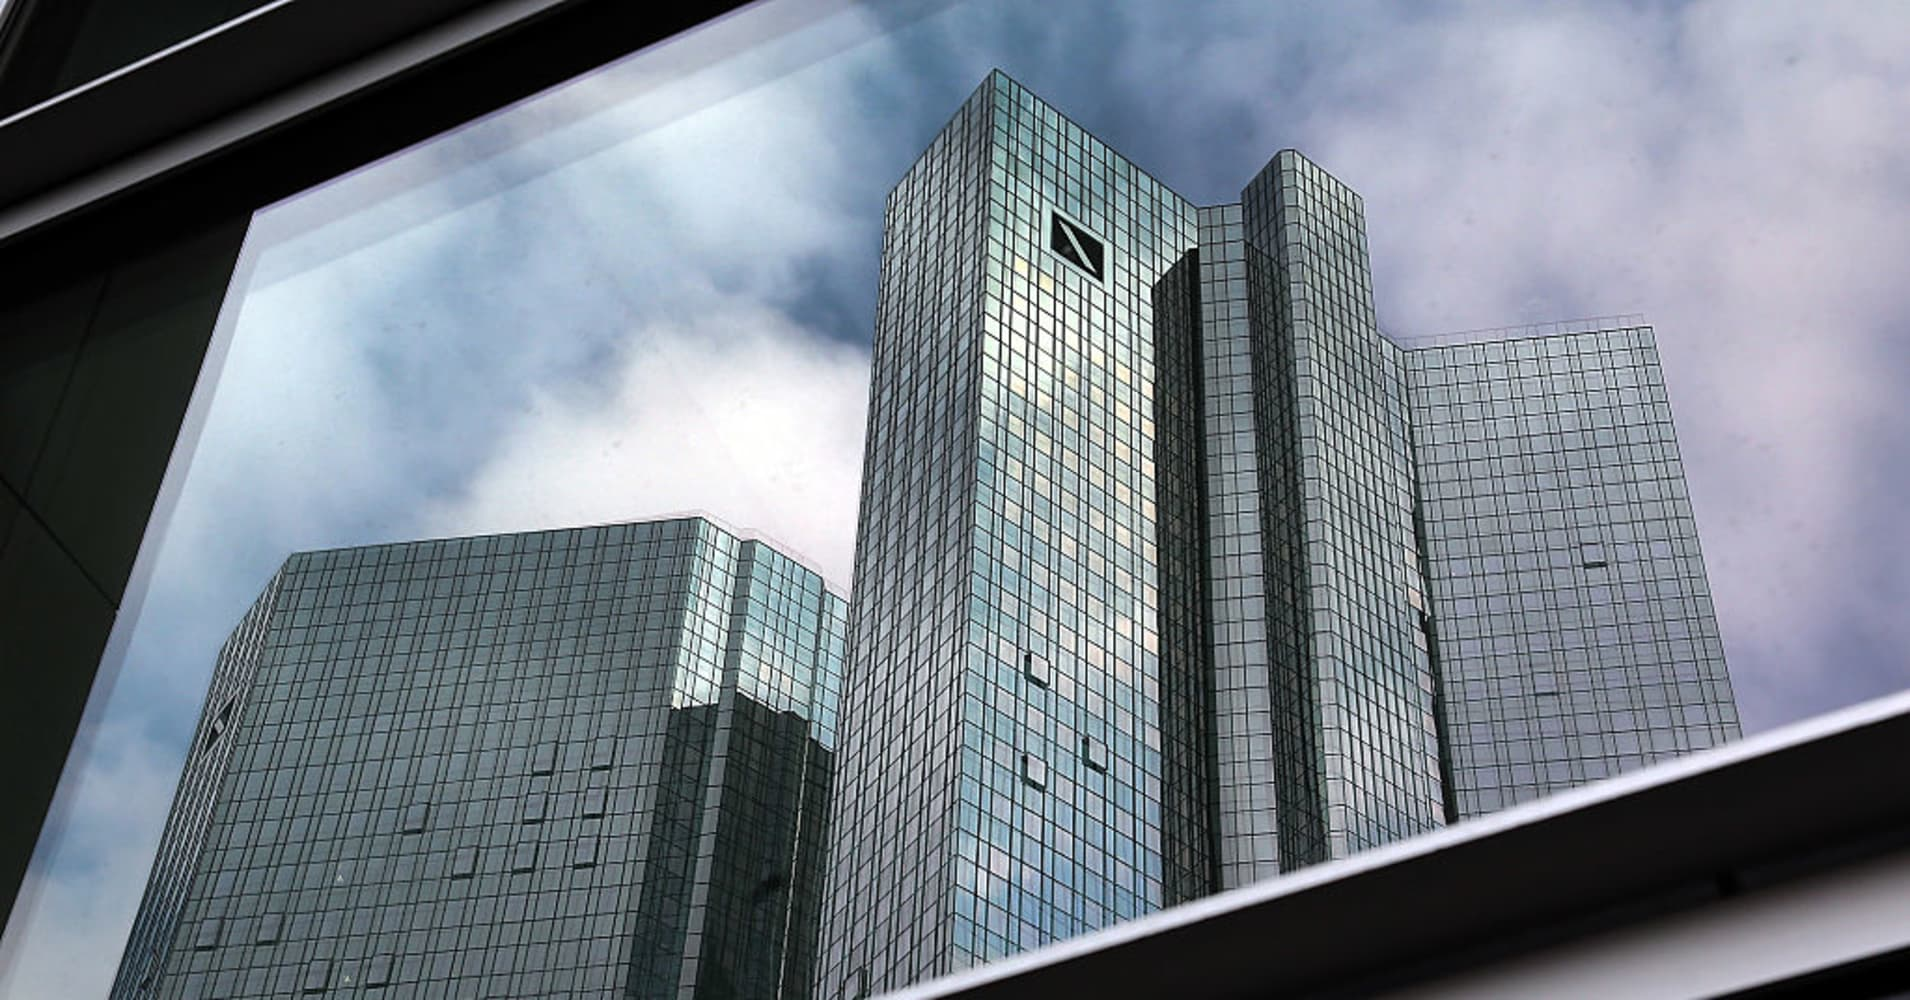 Police raids were not the fault of Deutsche Bank management, CFO says